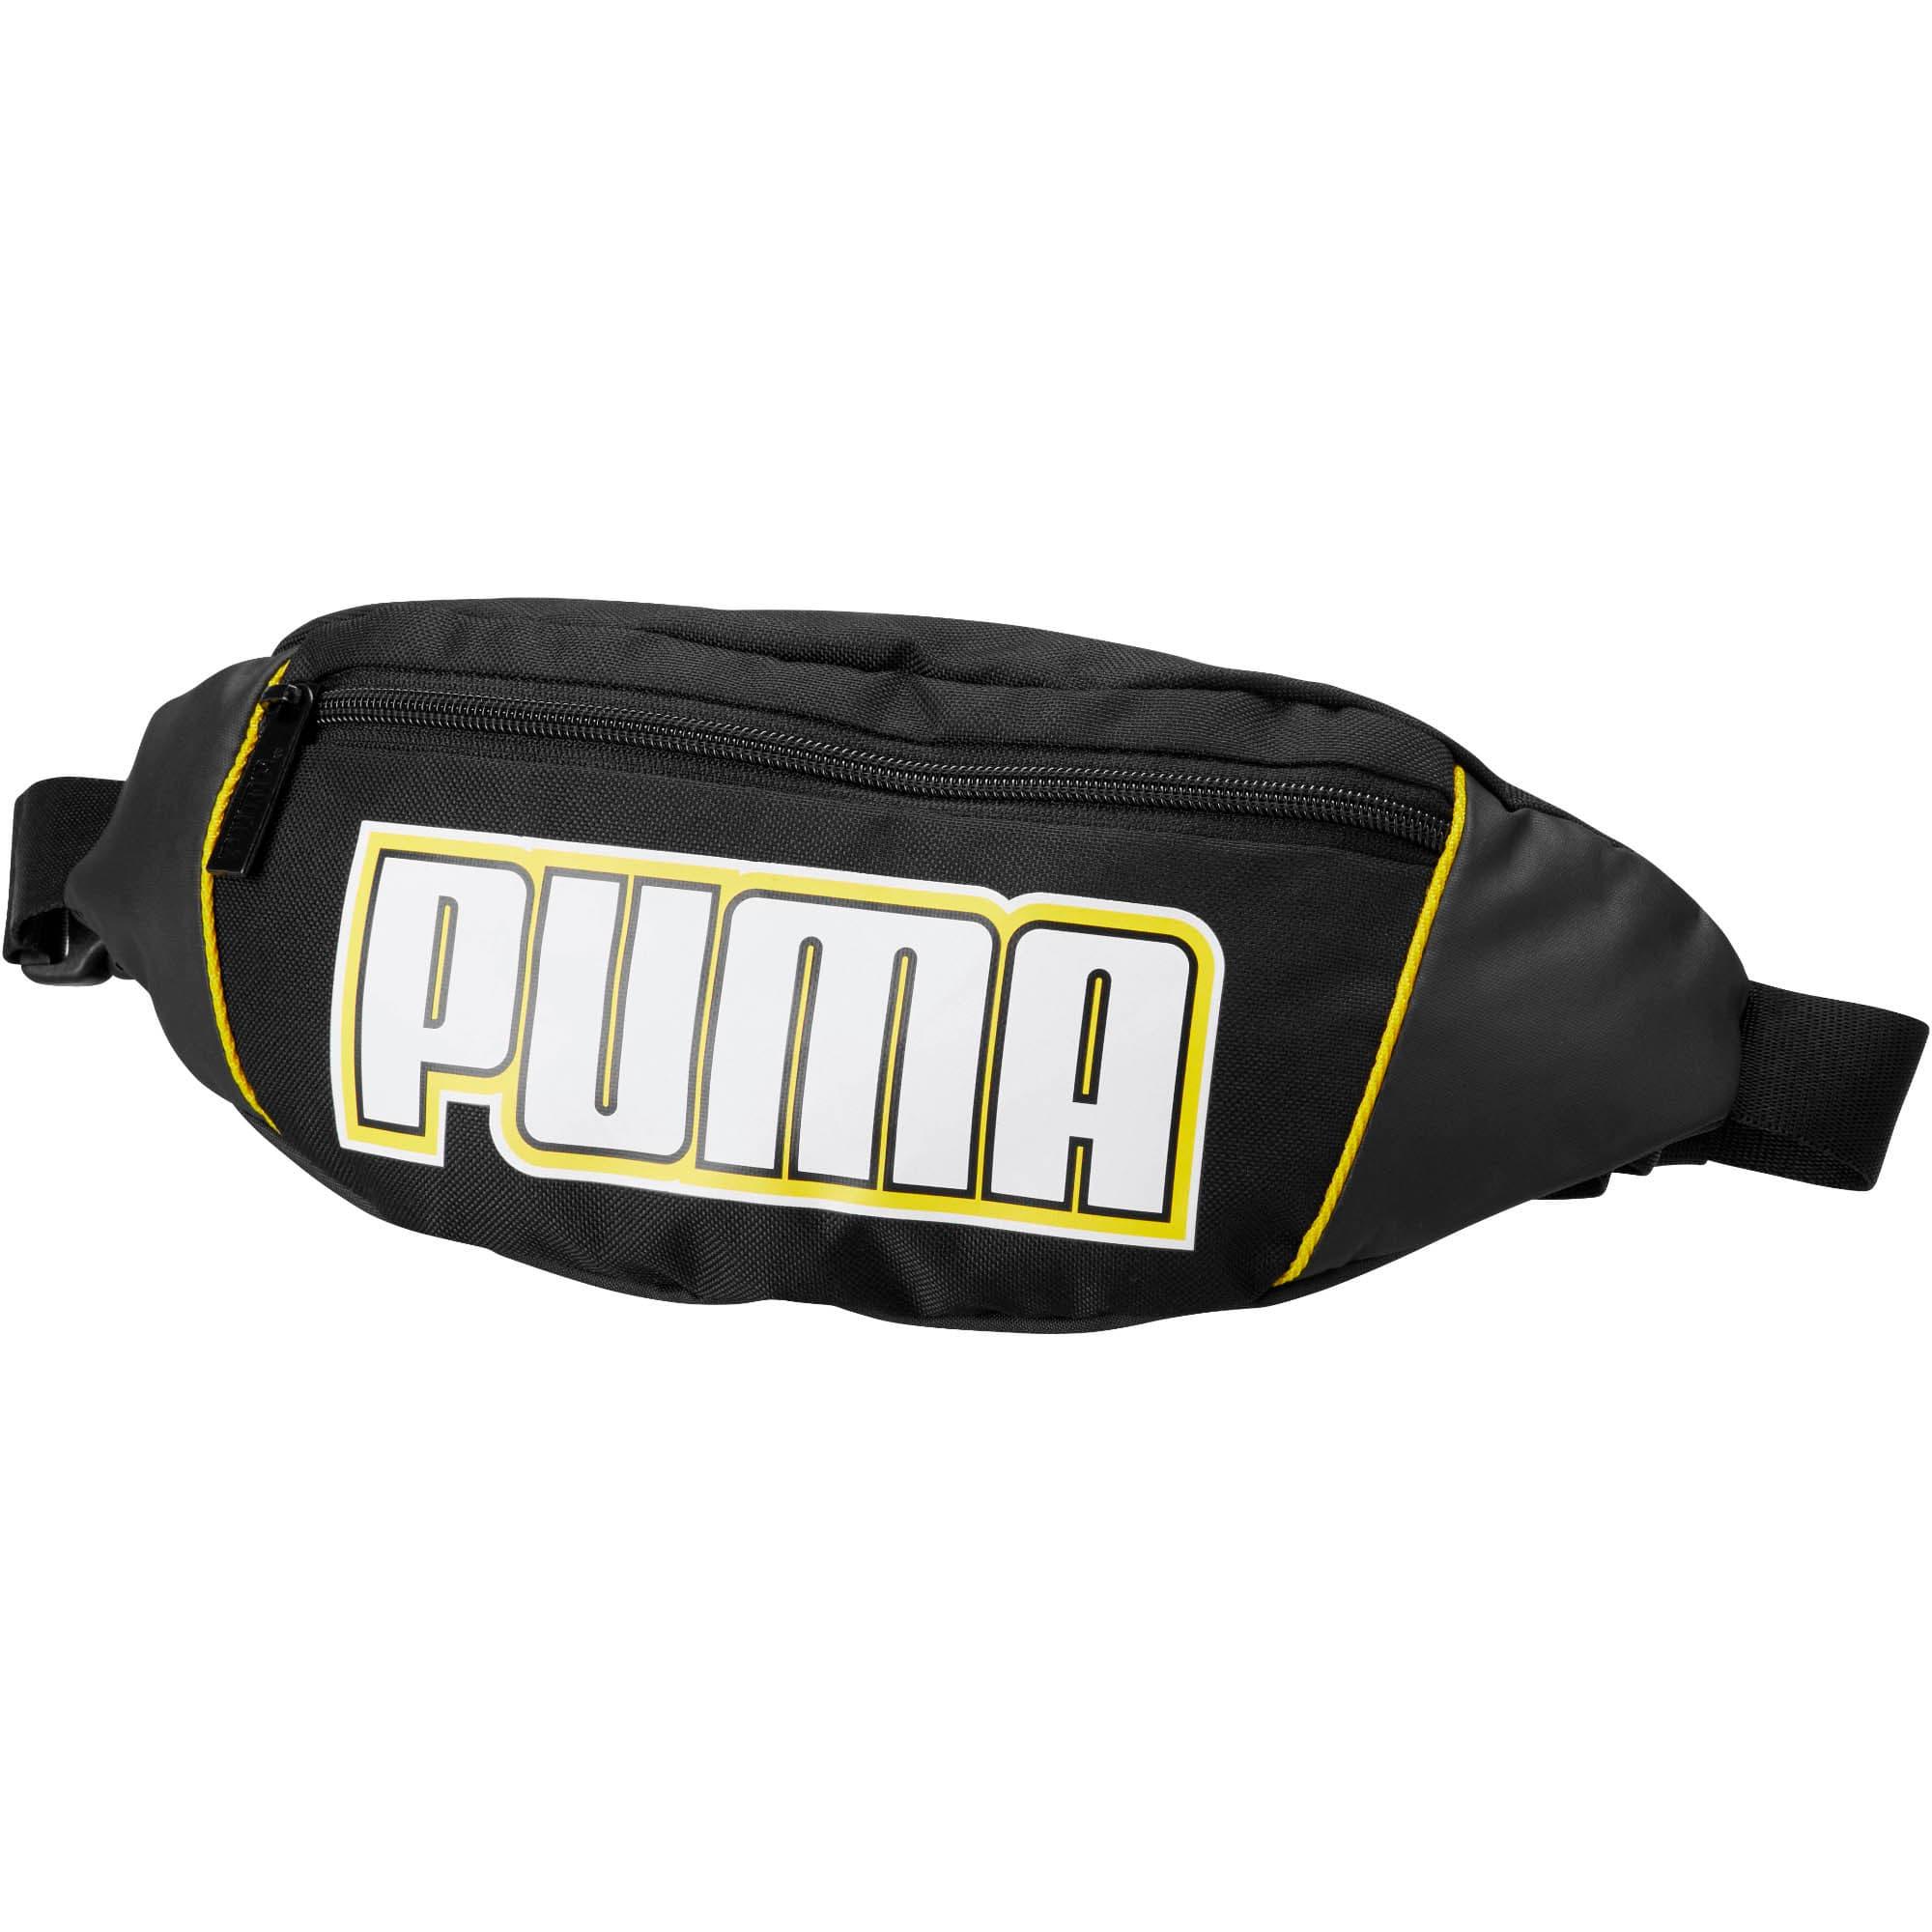 Thumbnail 1 of Women's Core Now Waist Bag, Puma Black, medium